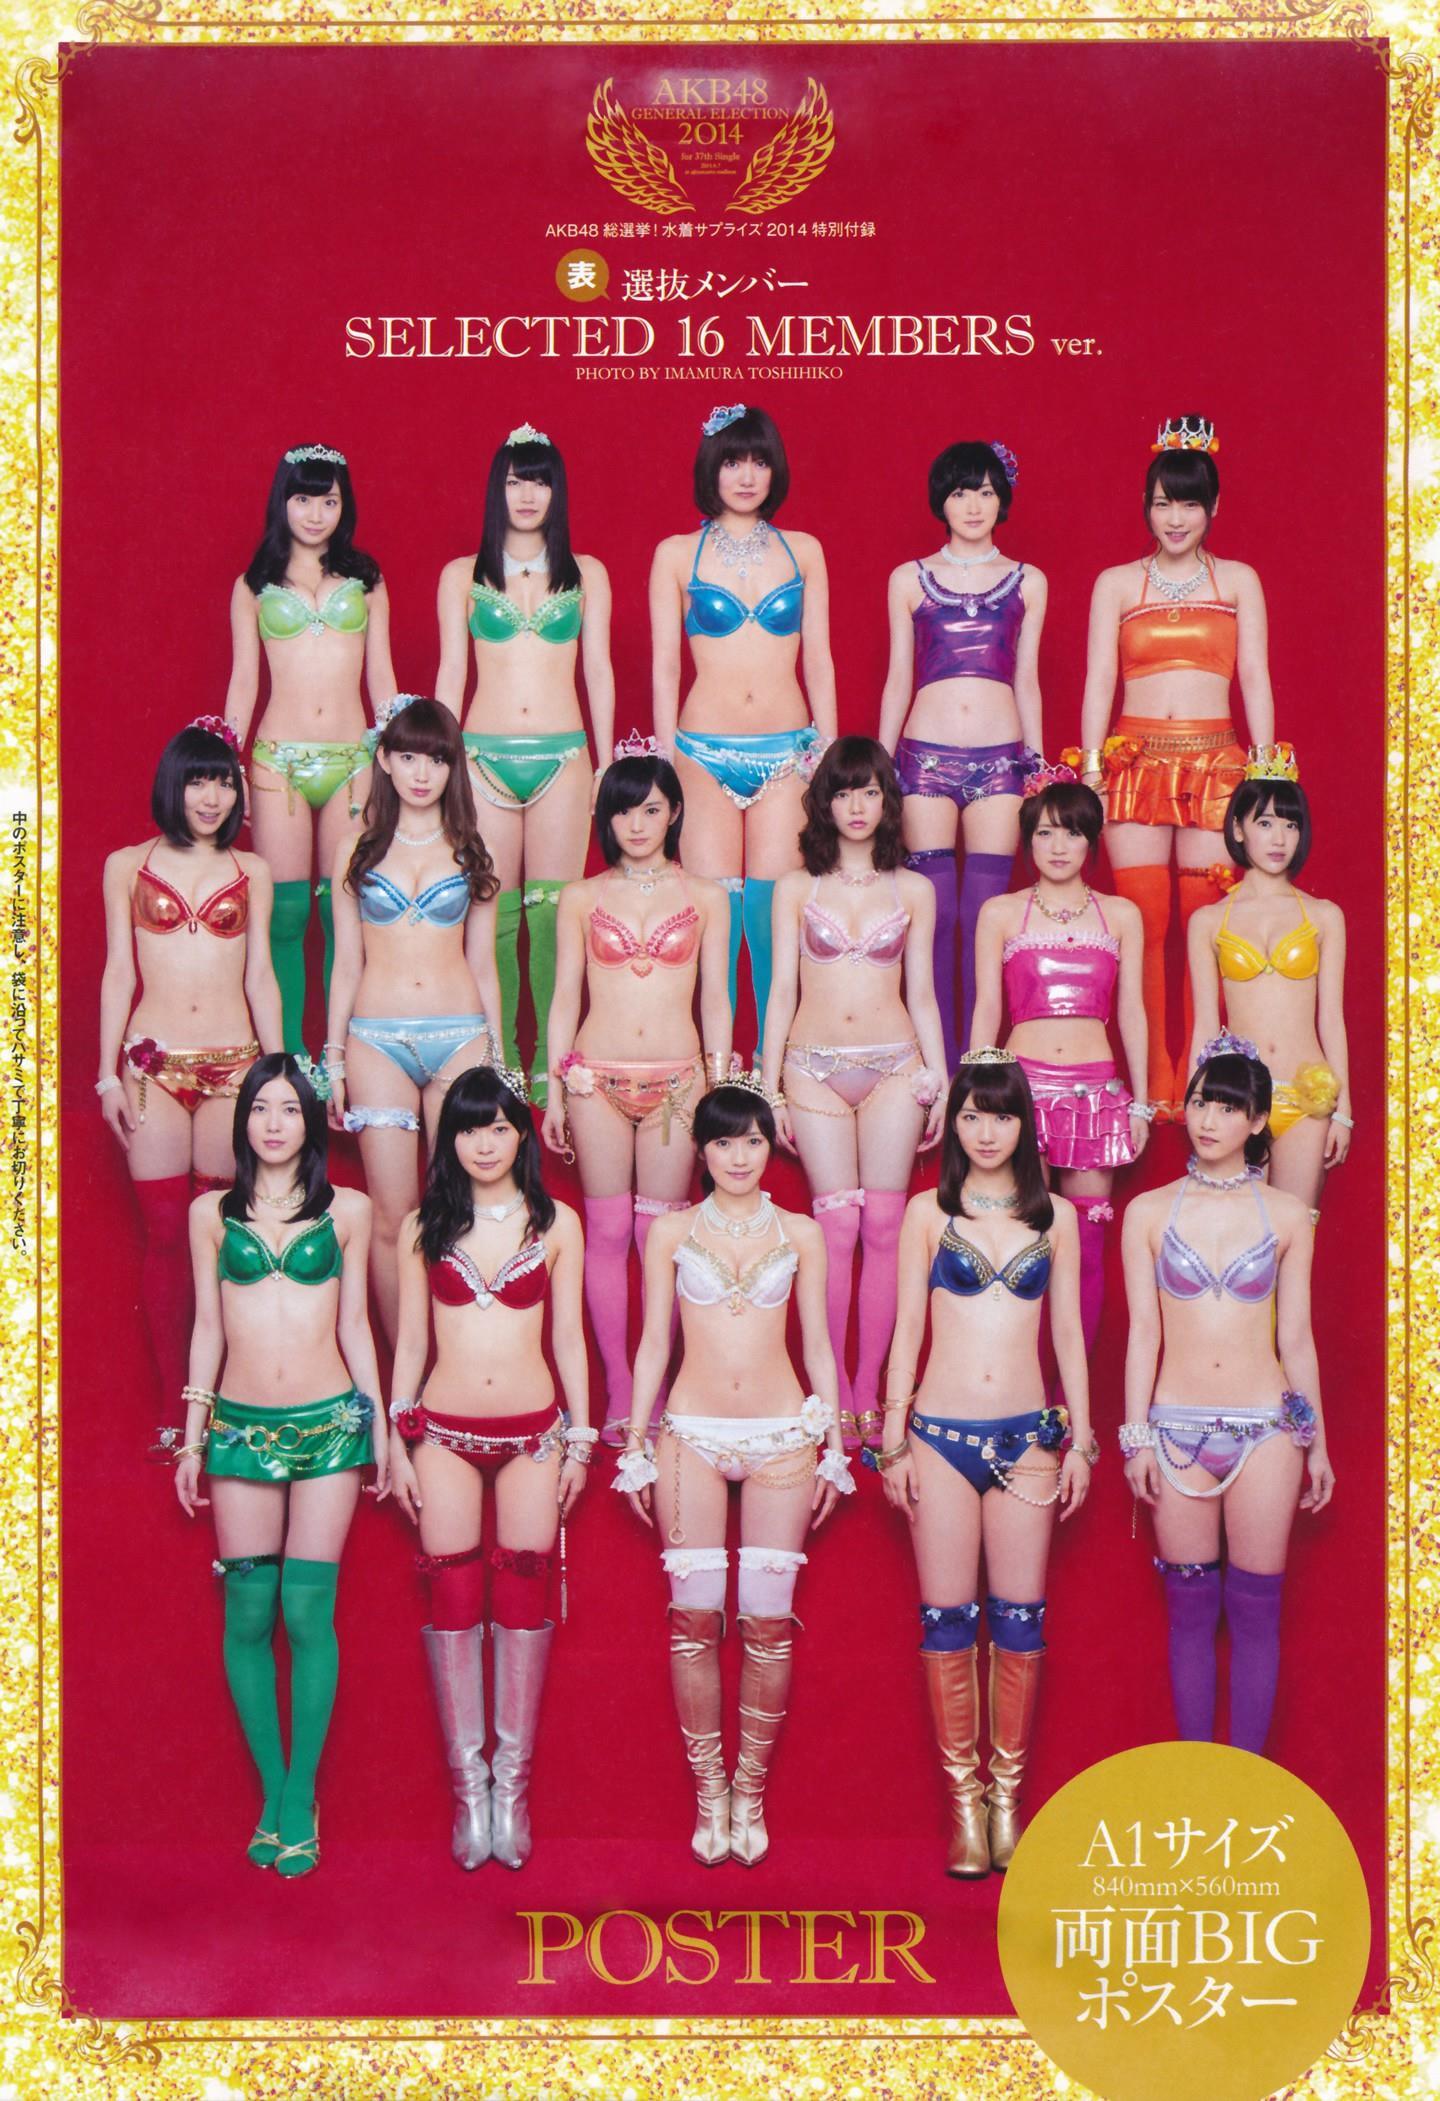 AKB48人気メンバー 画像 149